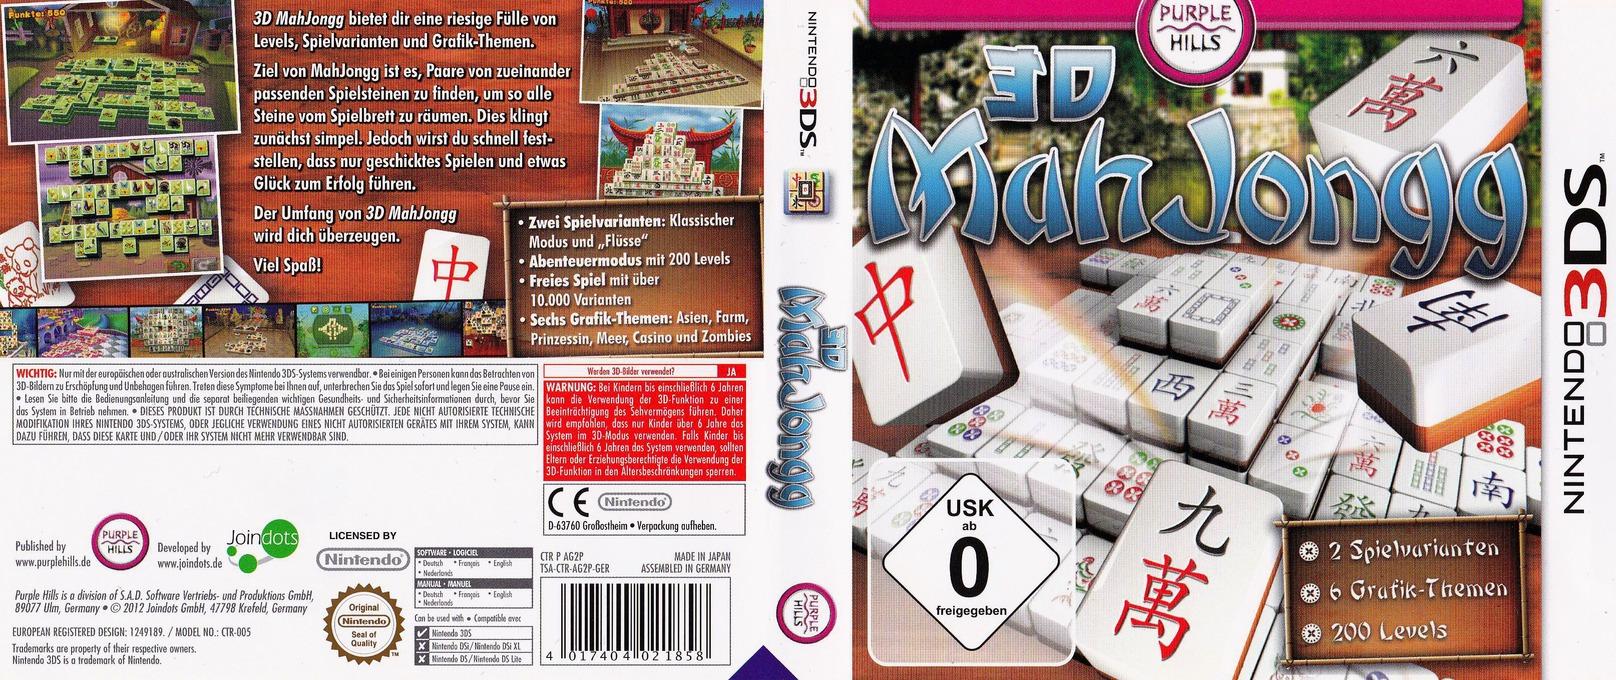 3DS coverfullHQ (AG2P)